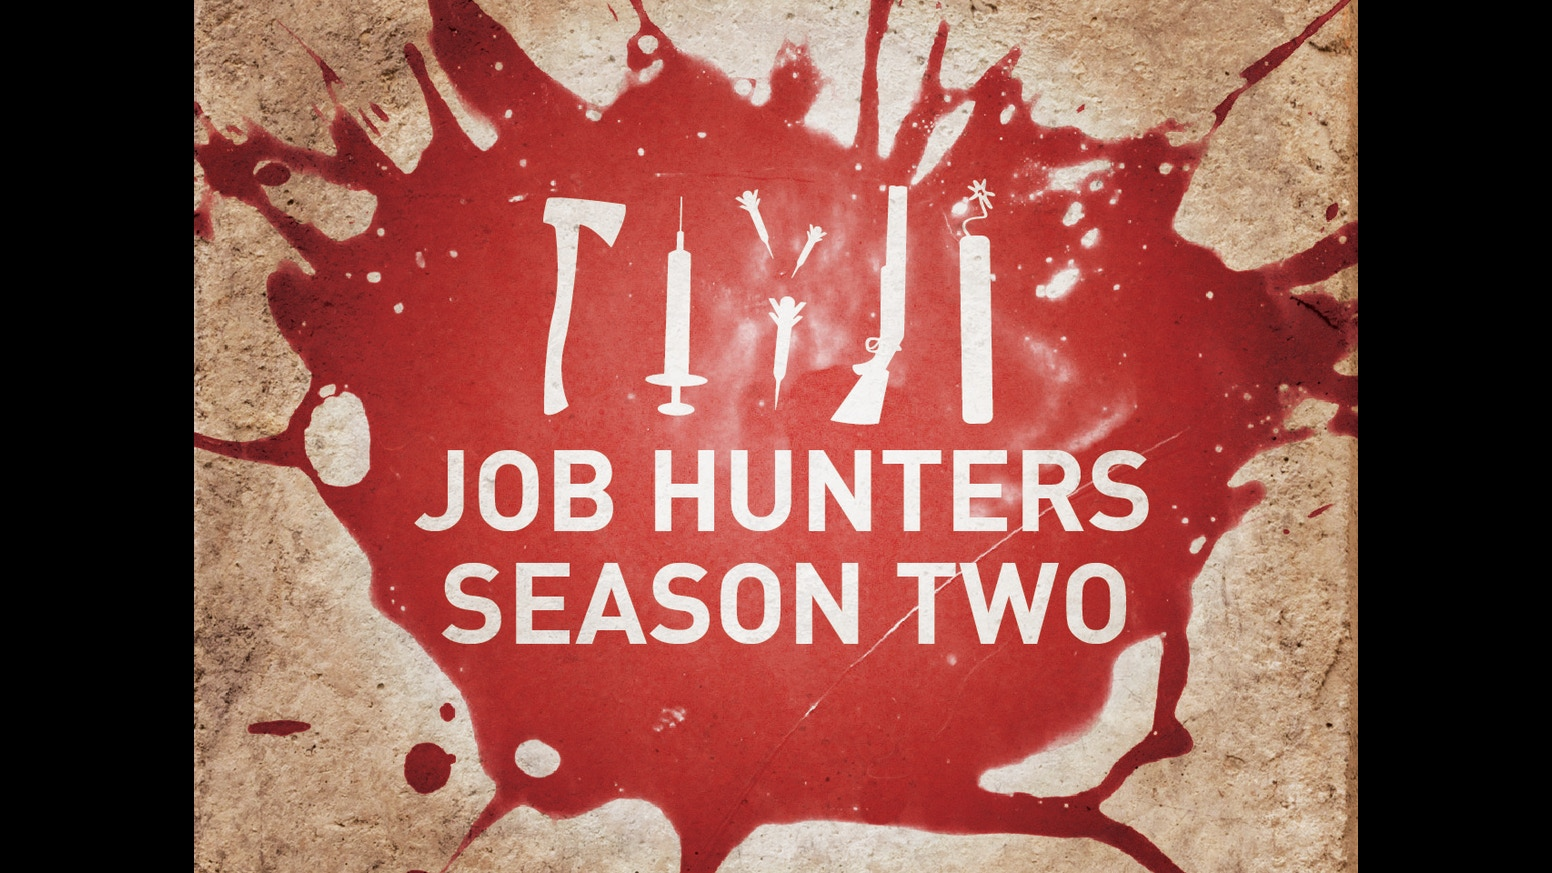 job hunters season two web series by job hunters kickstarter job hunters season two web series